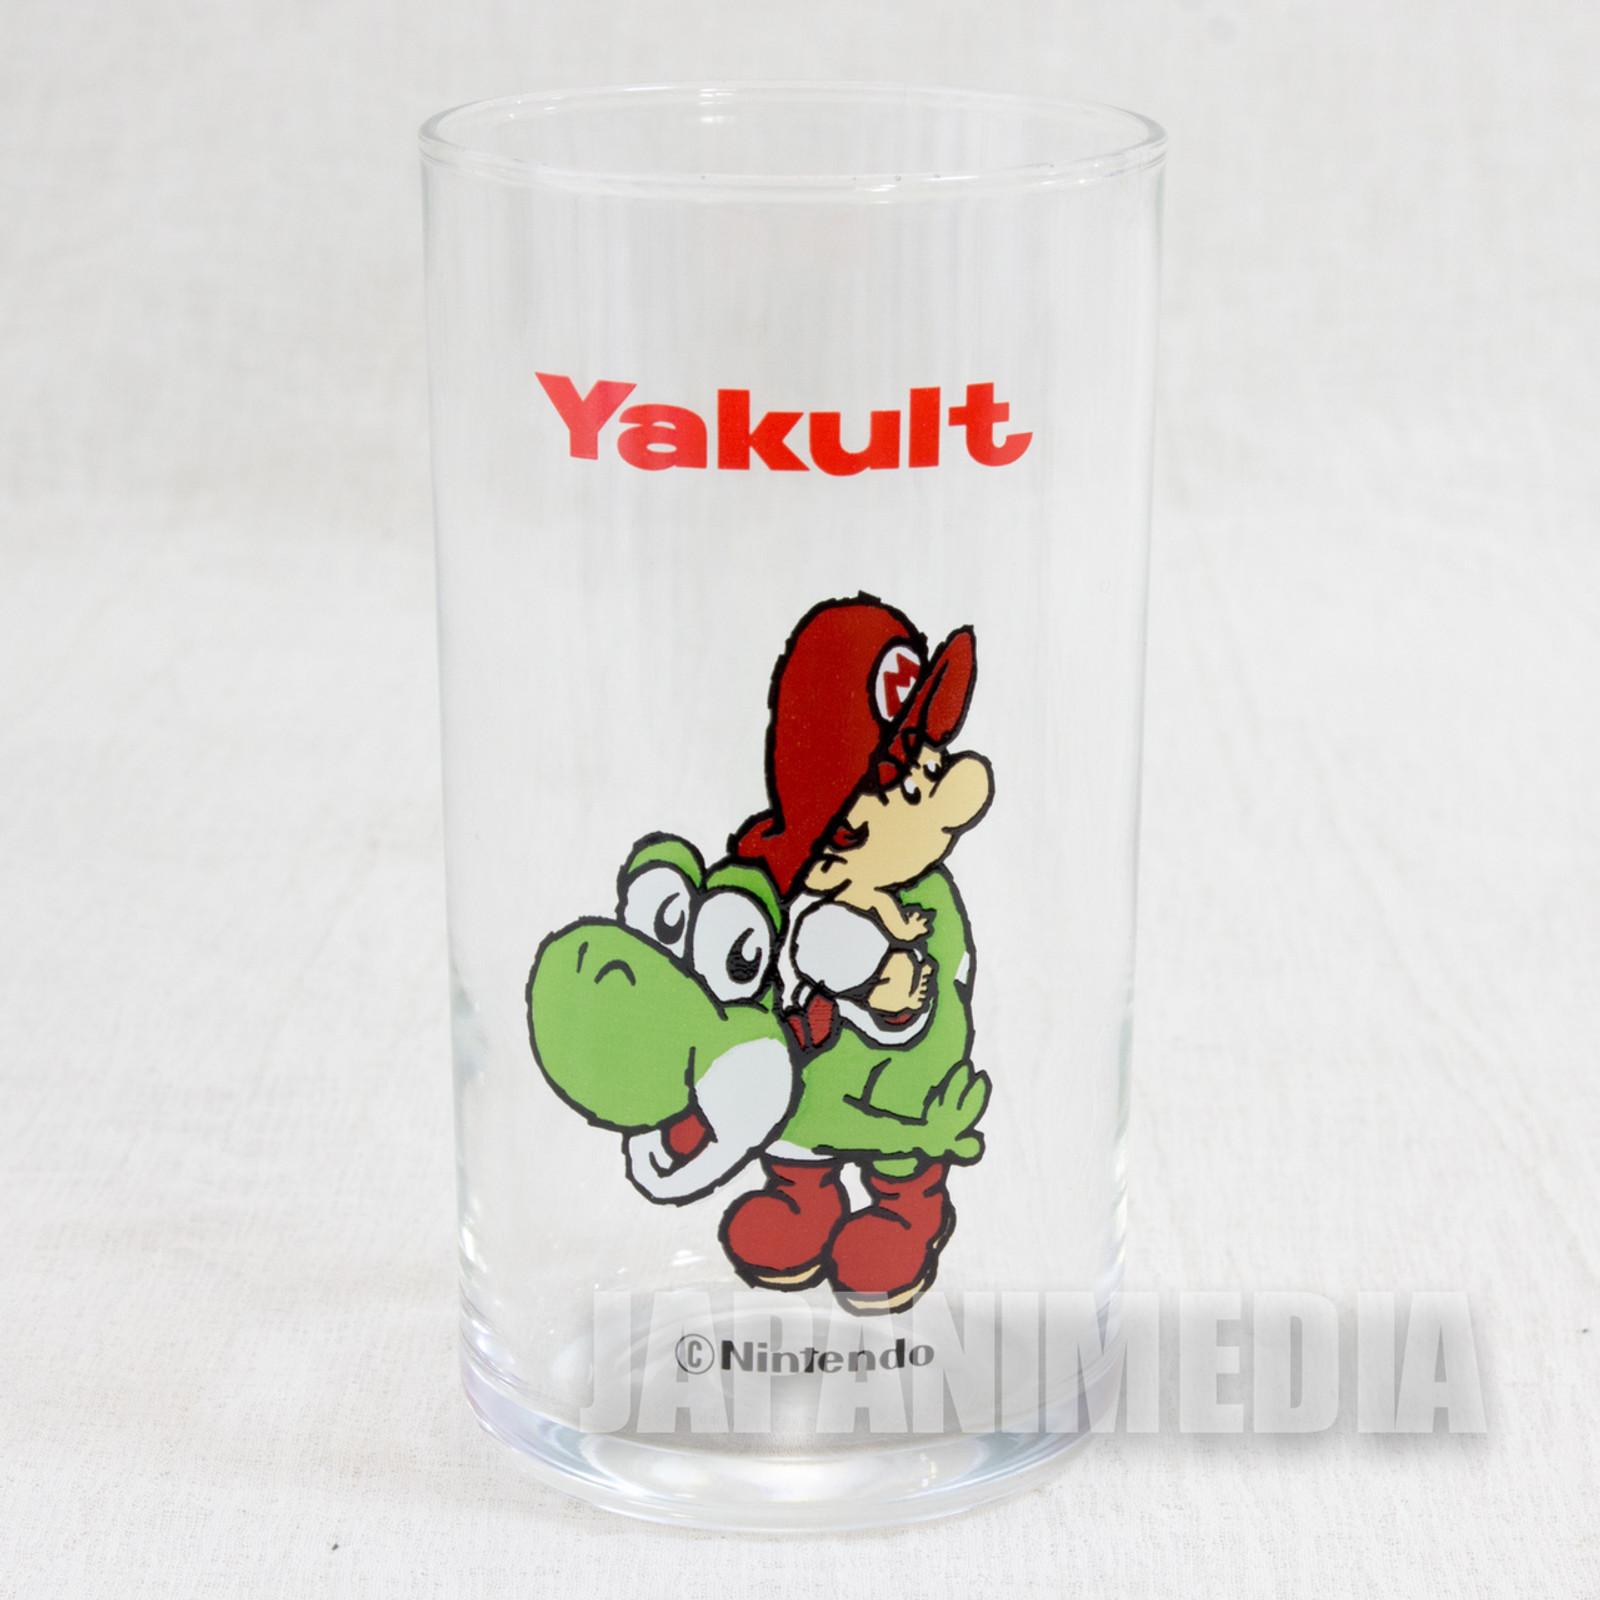 Retro RARE Super Mario Bros. Baby Mario on Yoshi Glass JAPAN GAME FAMICOM 2